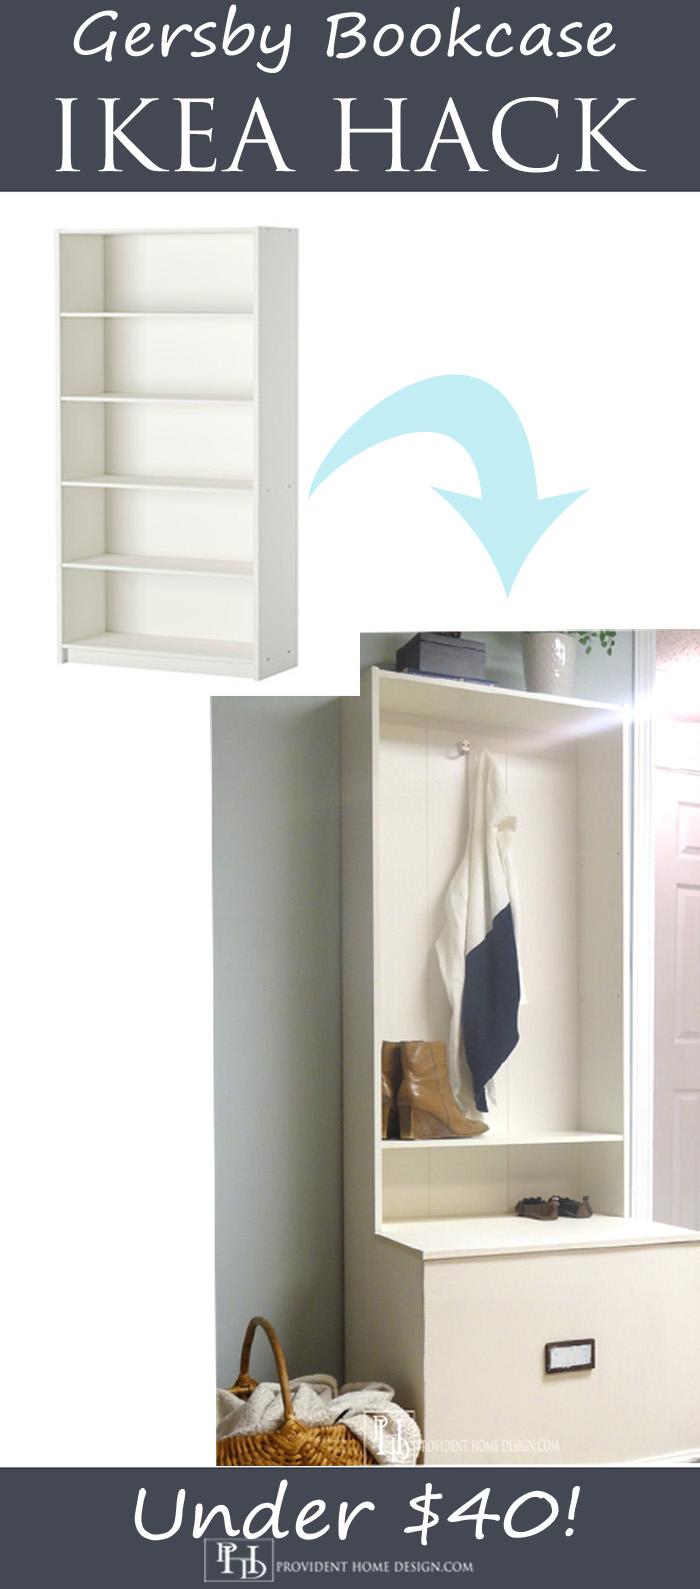 Gersby Bookcase Ikea Hack